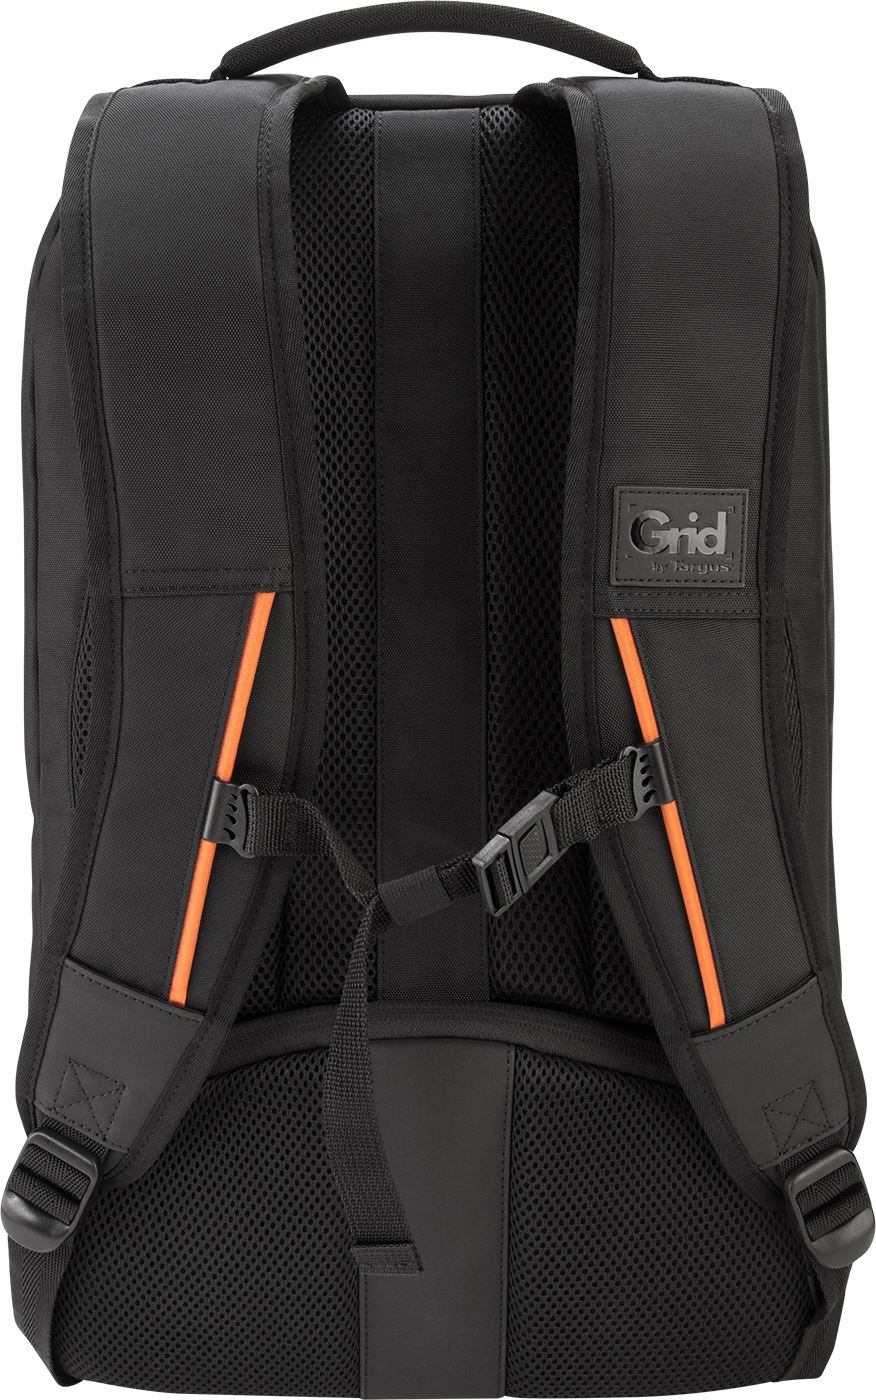 "16 High Impact Fast Growing Shrubs Yes We Mean Zoom: 16"" Grid Essential Backpack"